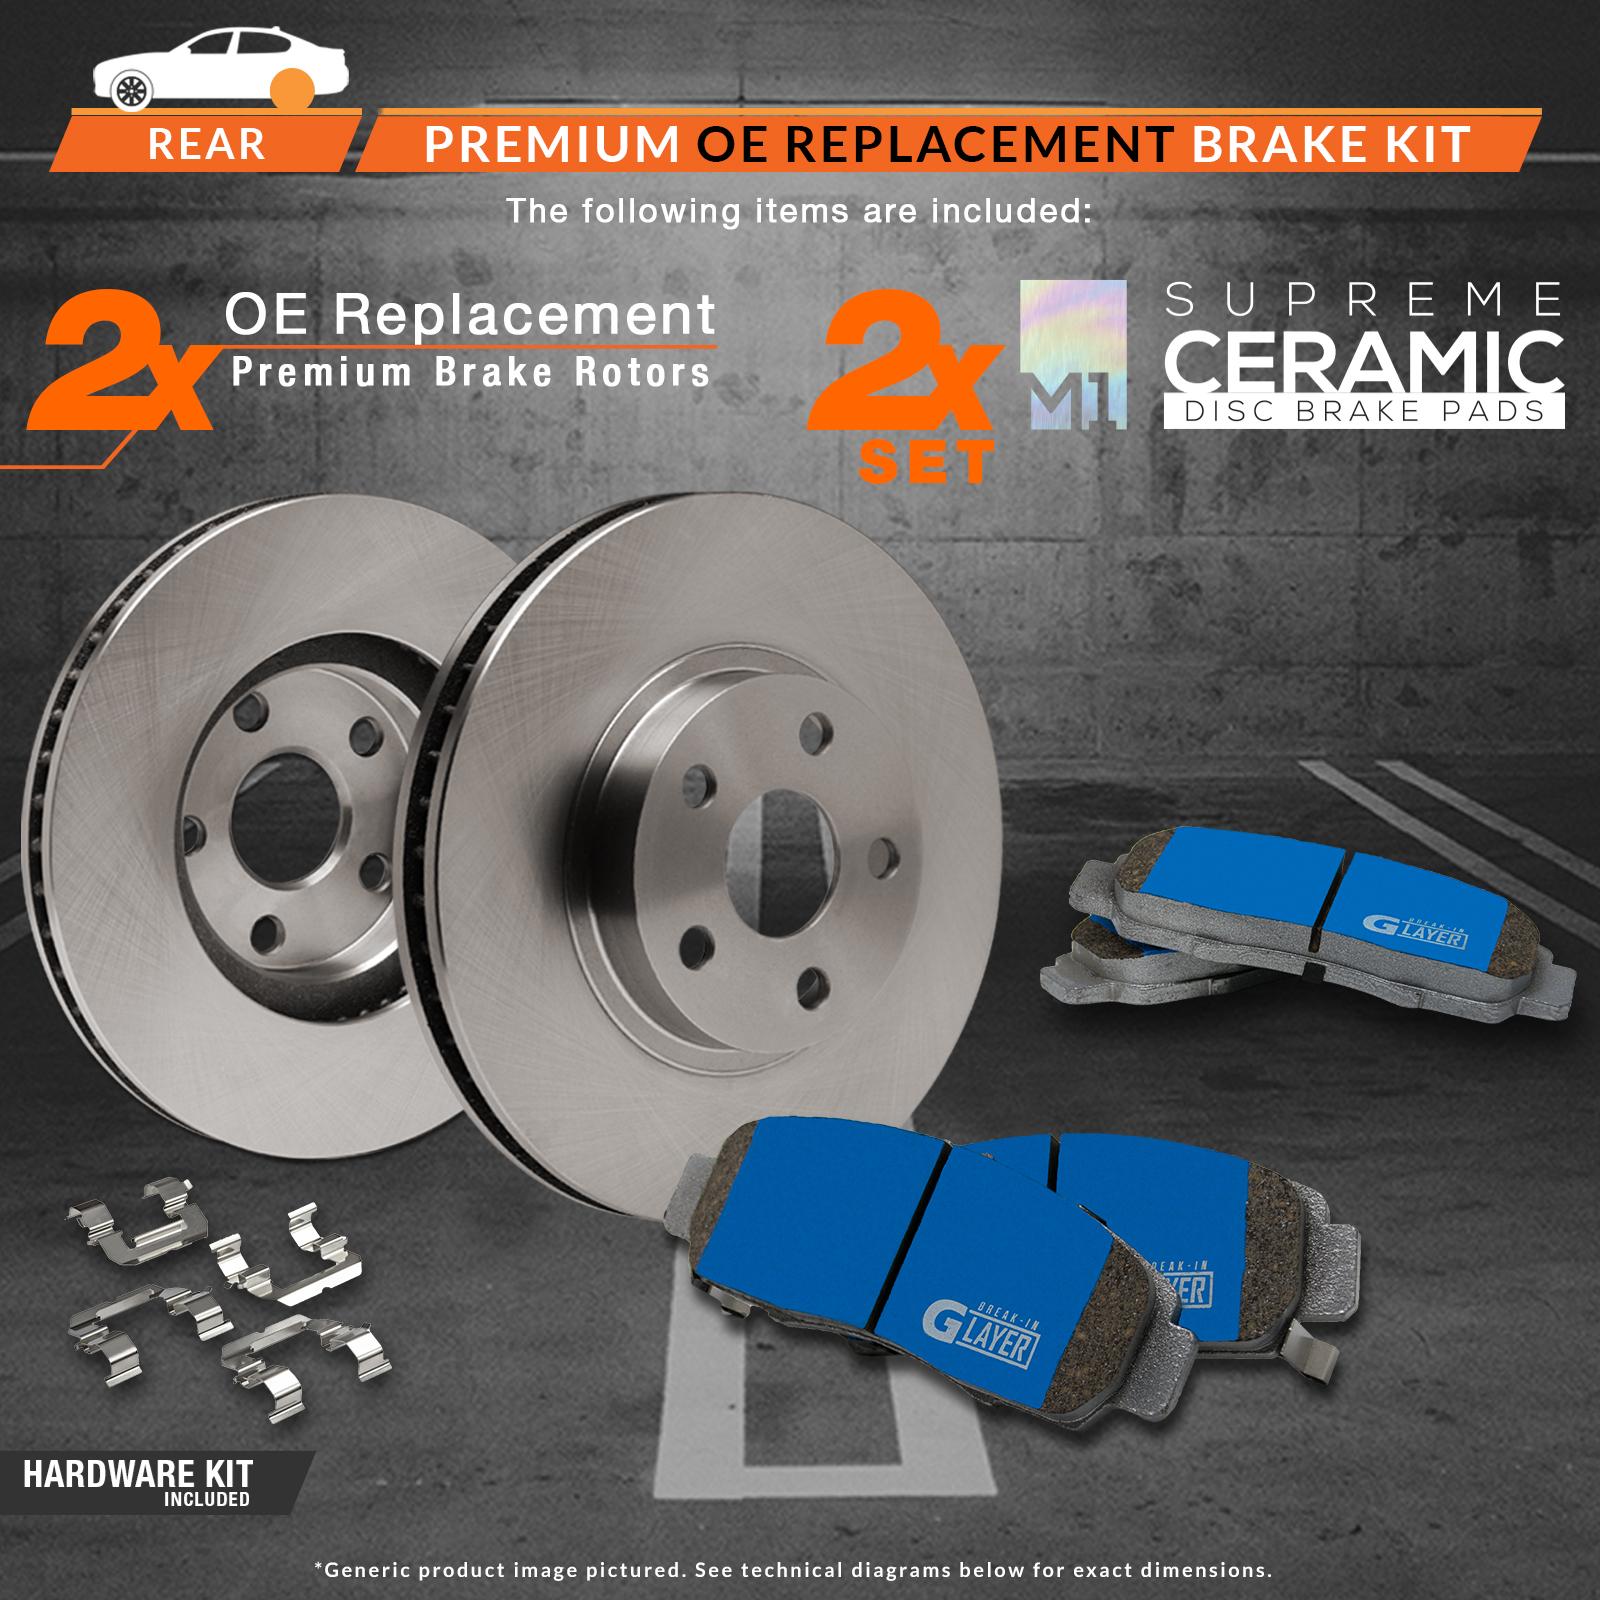 2010 2011 2012 Mercedes Benz GLK350 OE Replacement Rotors M1 Ceramic Pads R